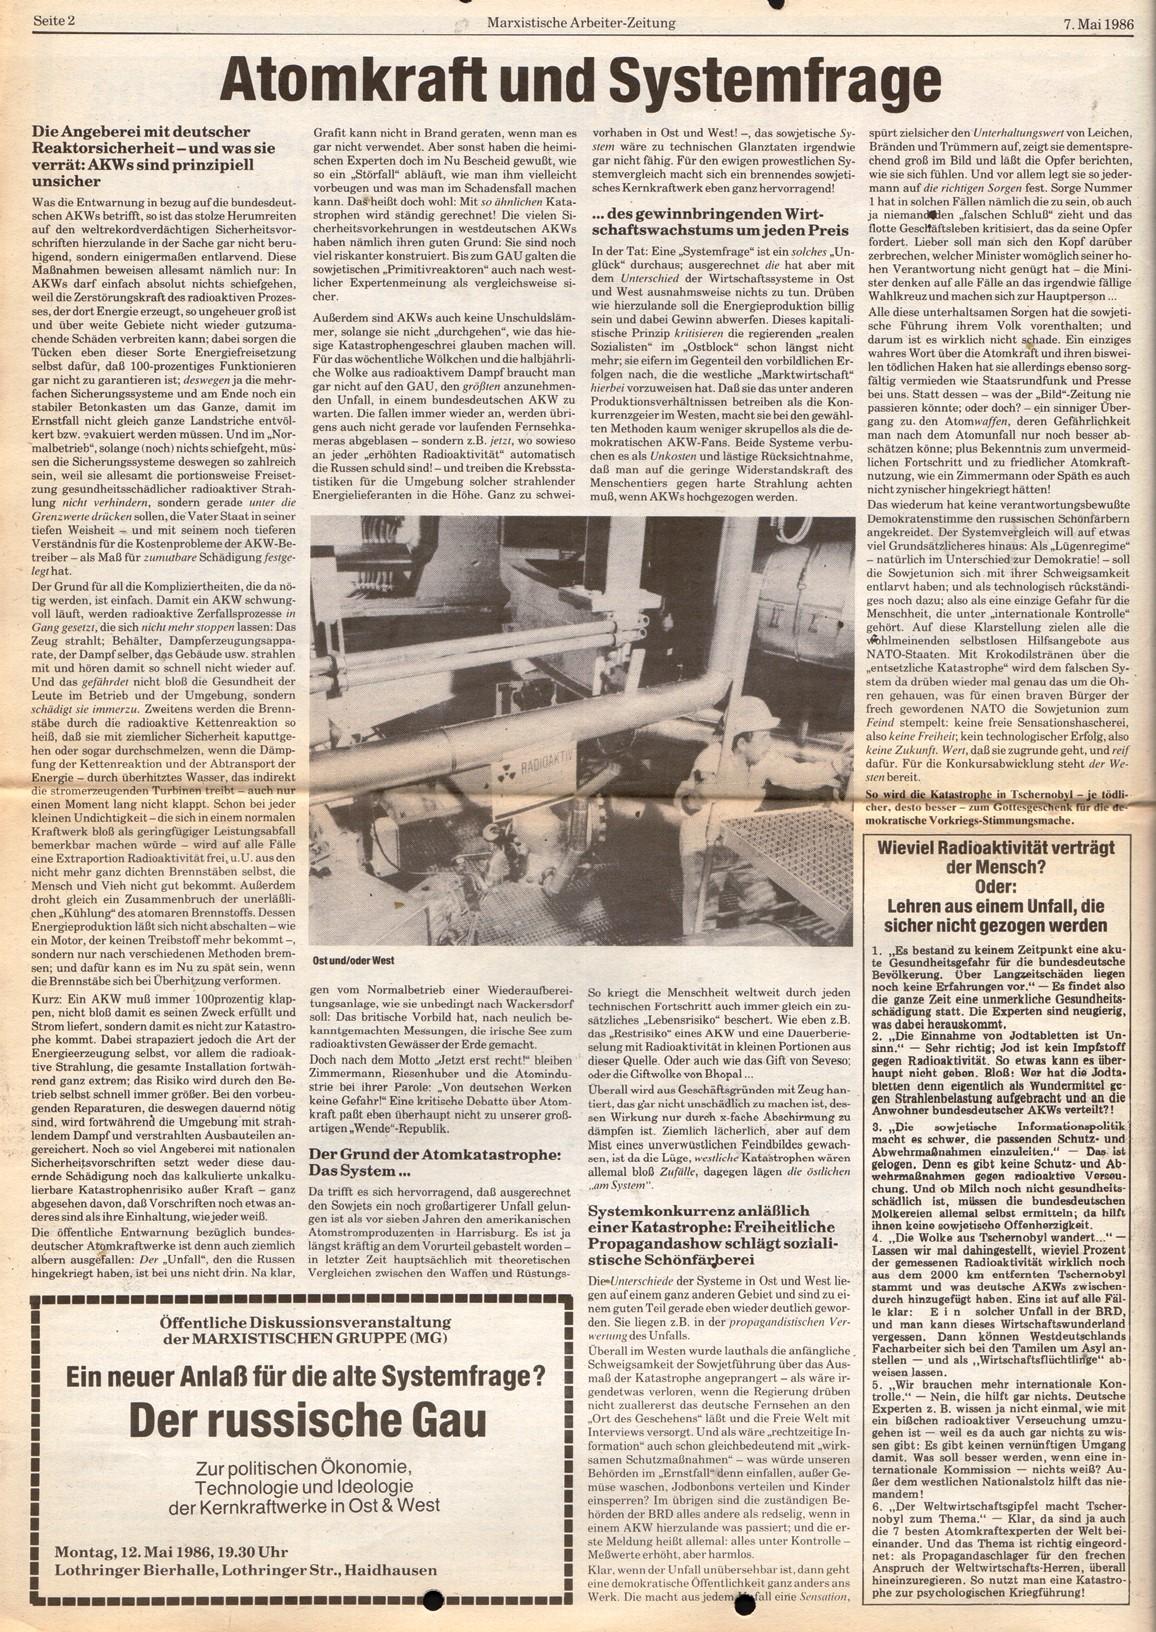 Muenchen_MG_MAZ_AGFA_19860507_02